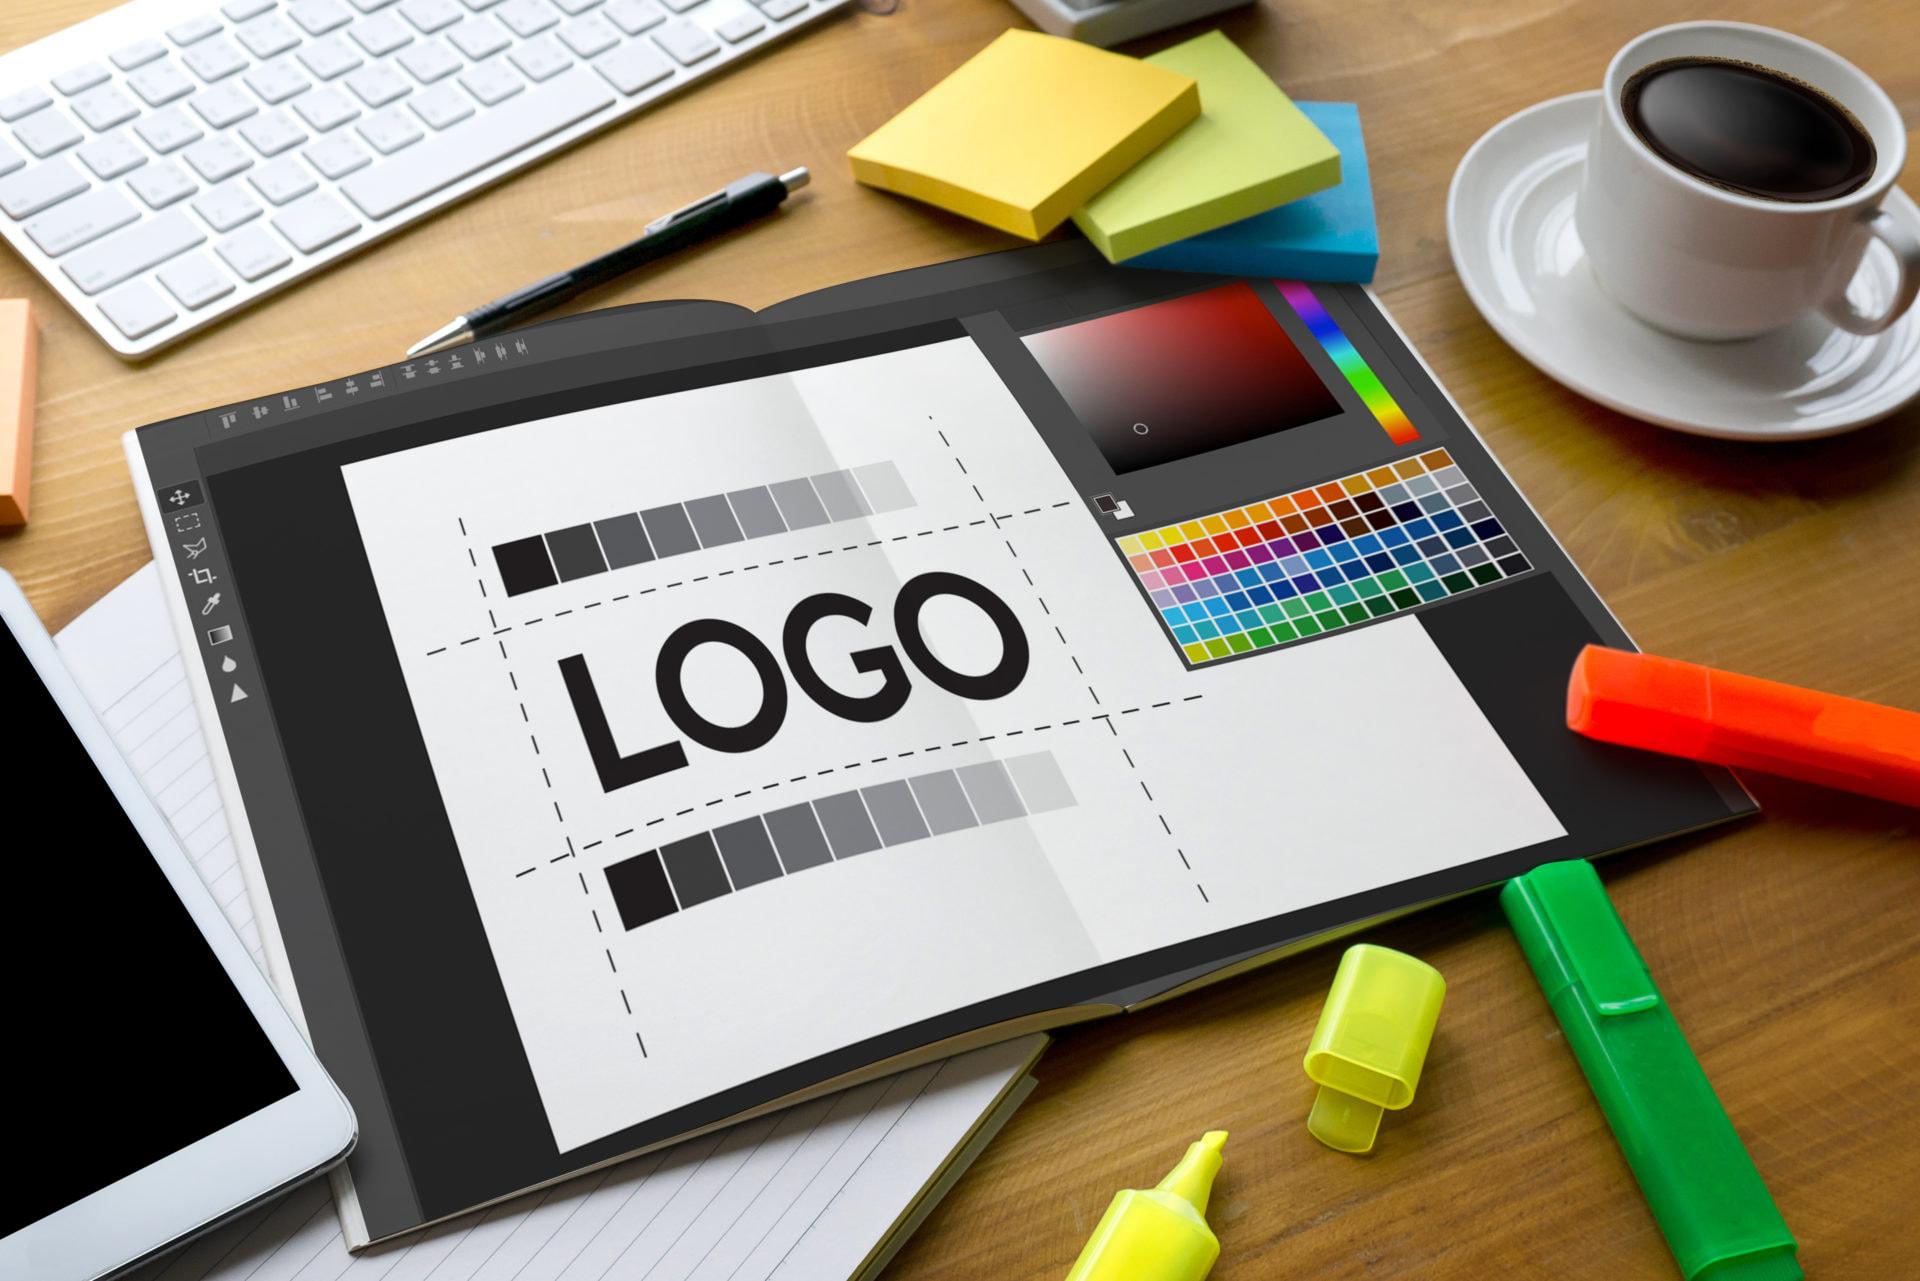 30 flat logo design ideas